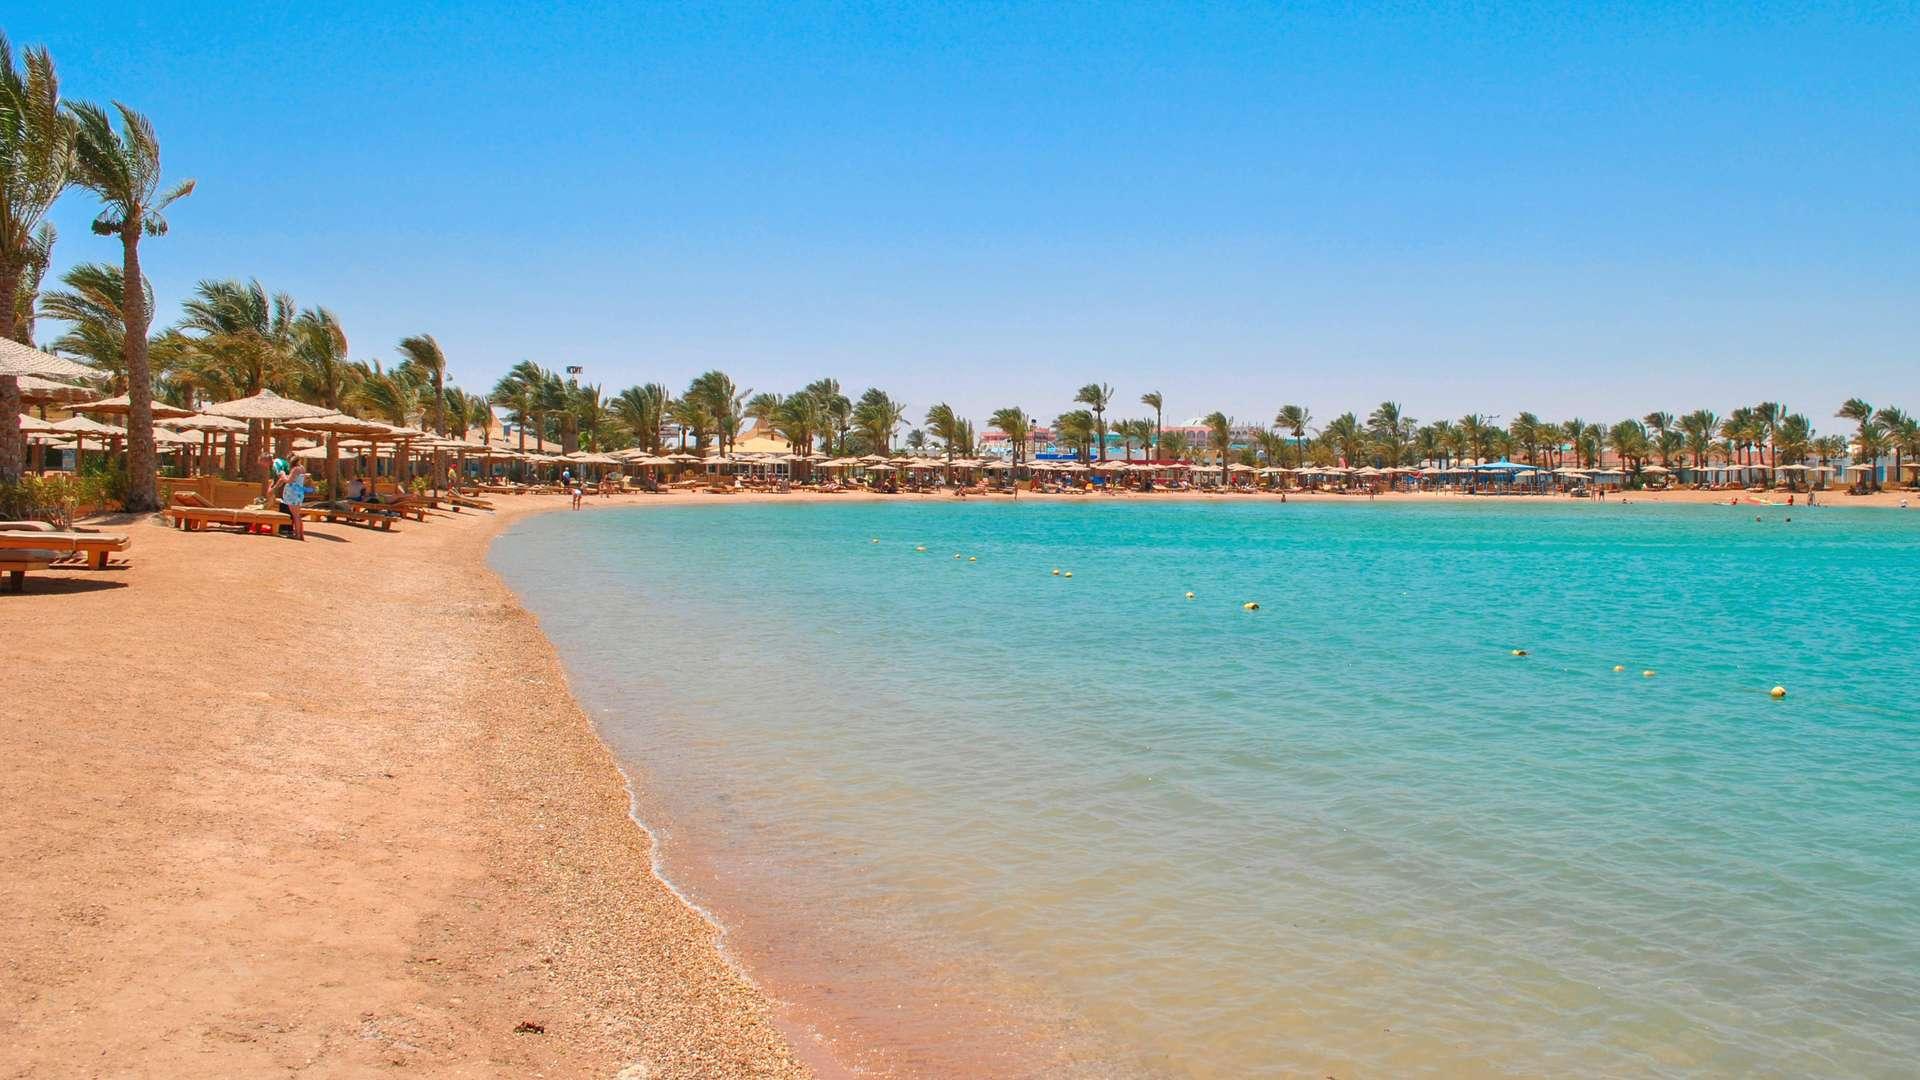 Egypt Resorts Hotels 2021 2022 The Best Luxury Resorts In Egypt